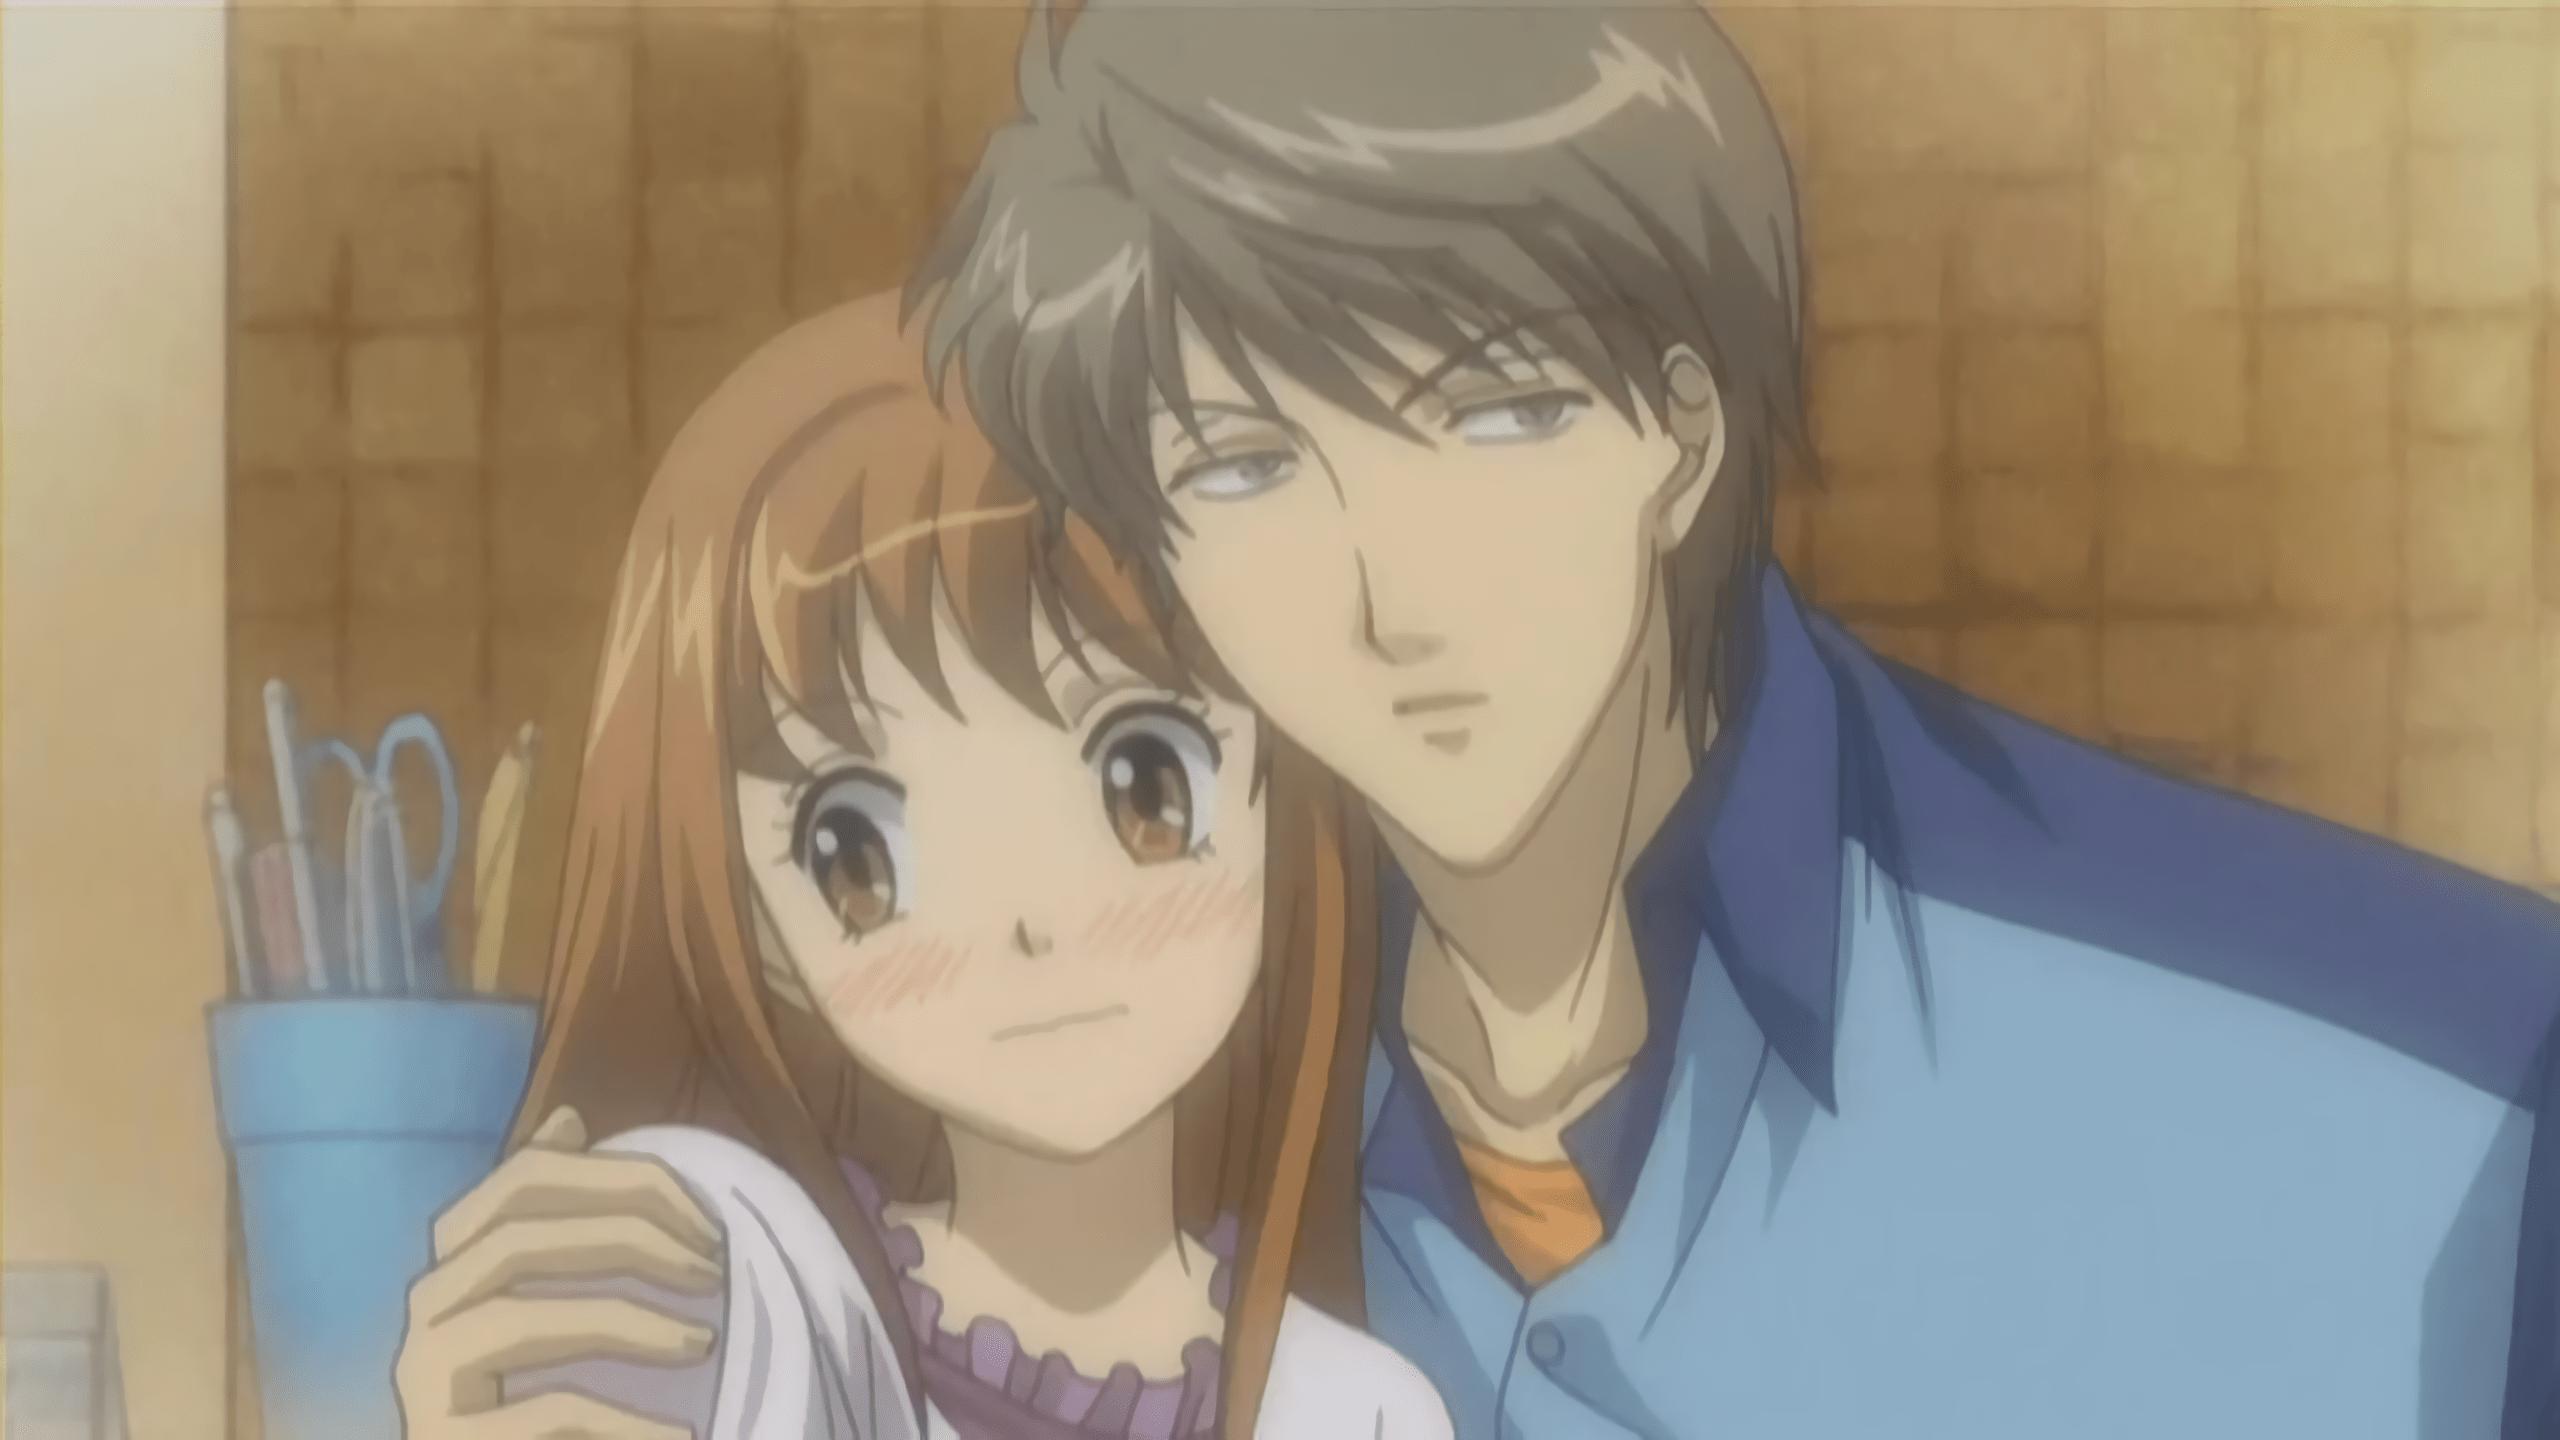 anime like ao haru ride anime recommendations Itazura na Kiss